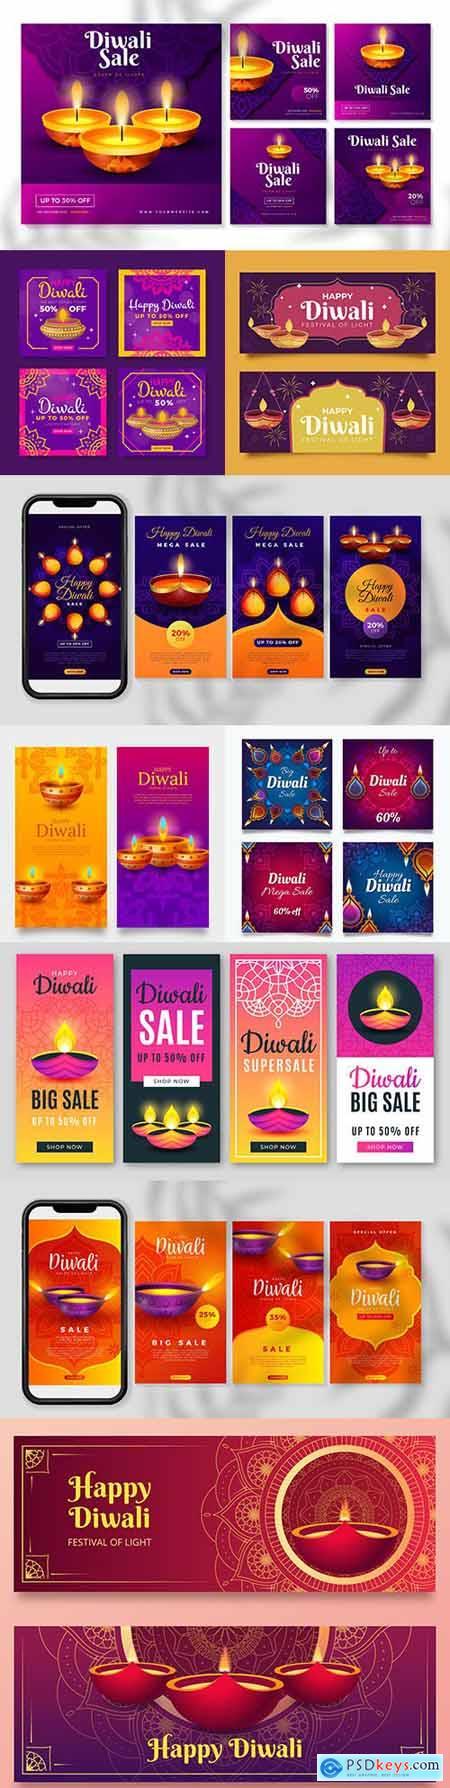 Diwali Indian traditional culture decoration illustration 6